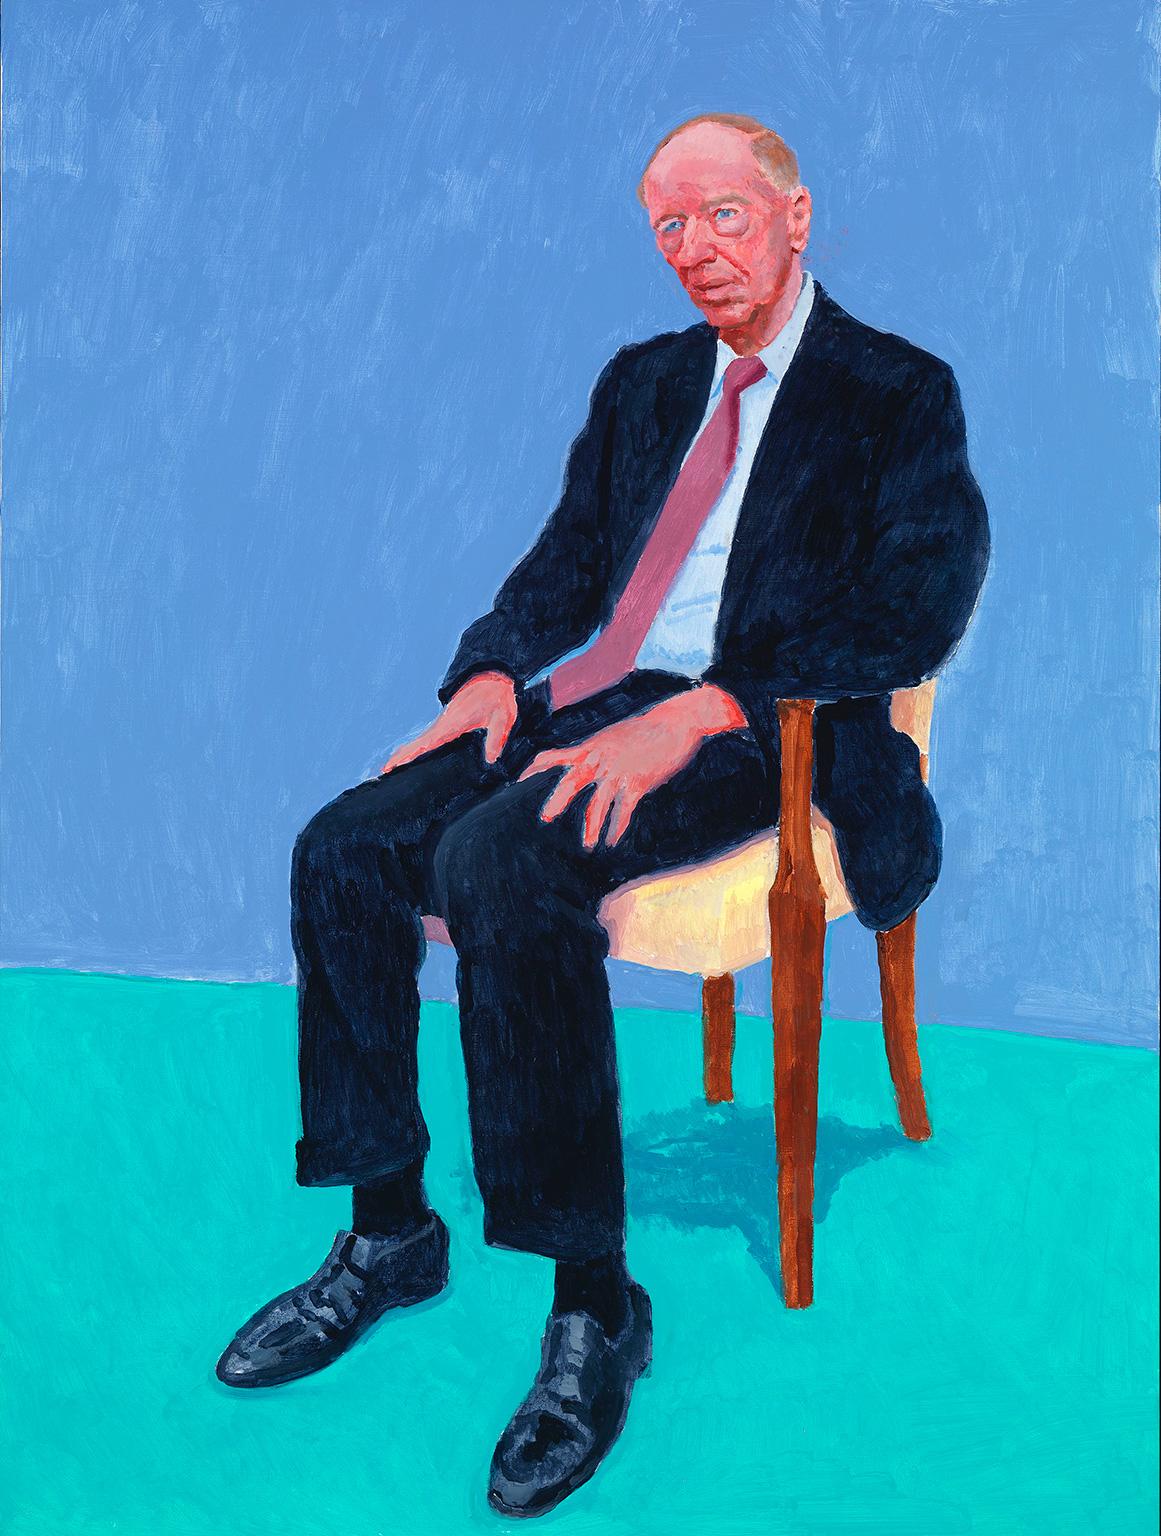 David Hockney, Lord Jacob Rothschild, 5-6 February, 2014 © David Hockney. Photo credit: Richard Schmidt